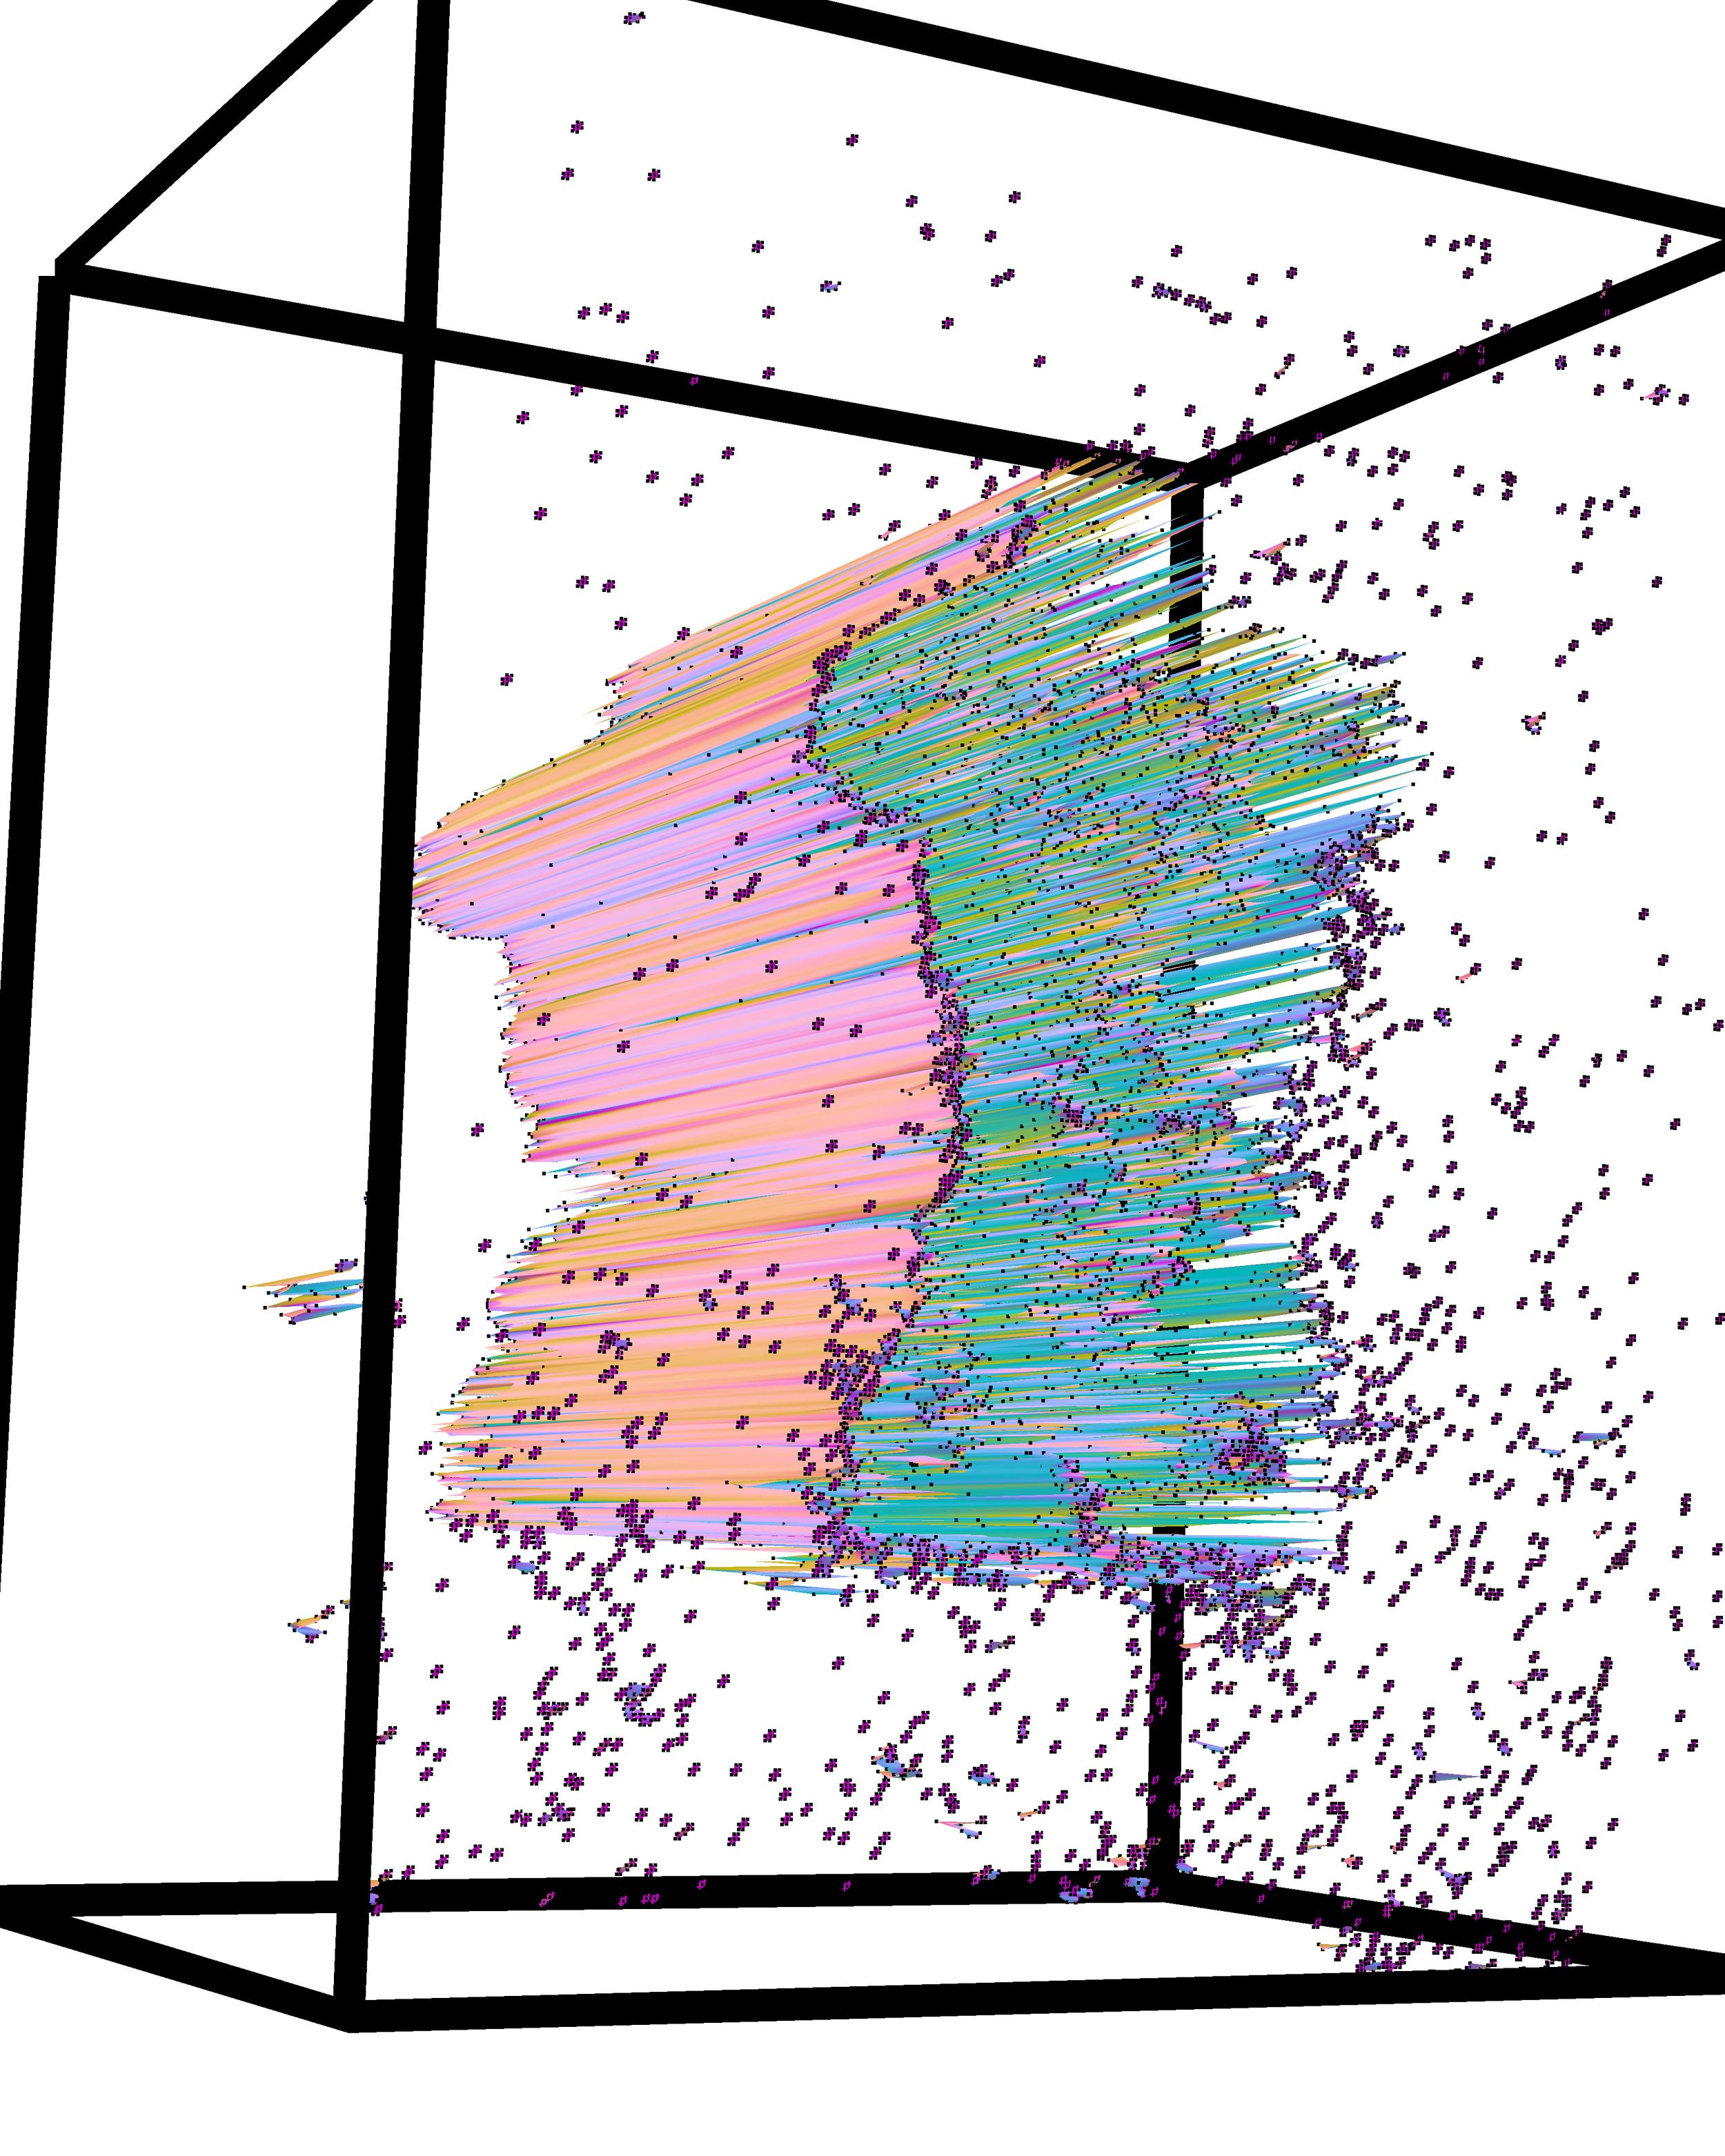 framedfigure_01.jpg